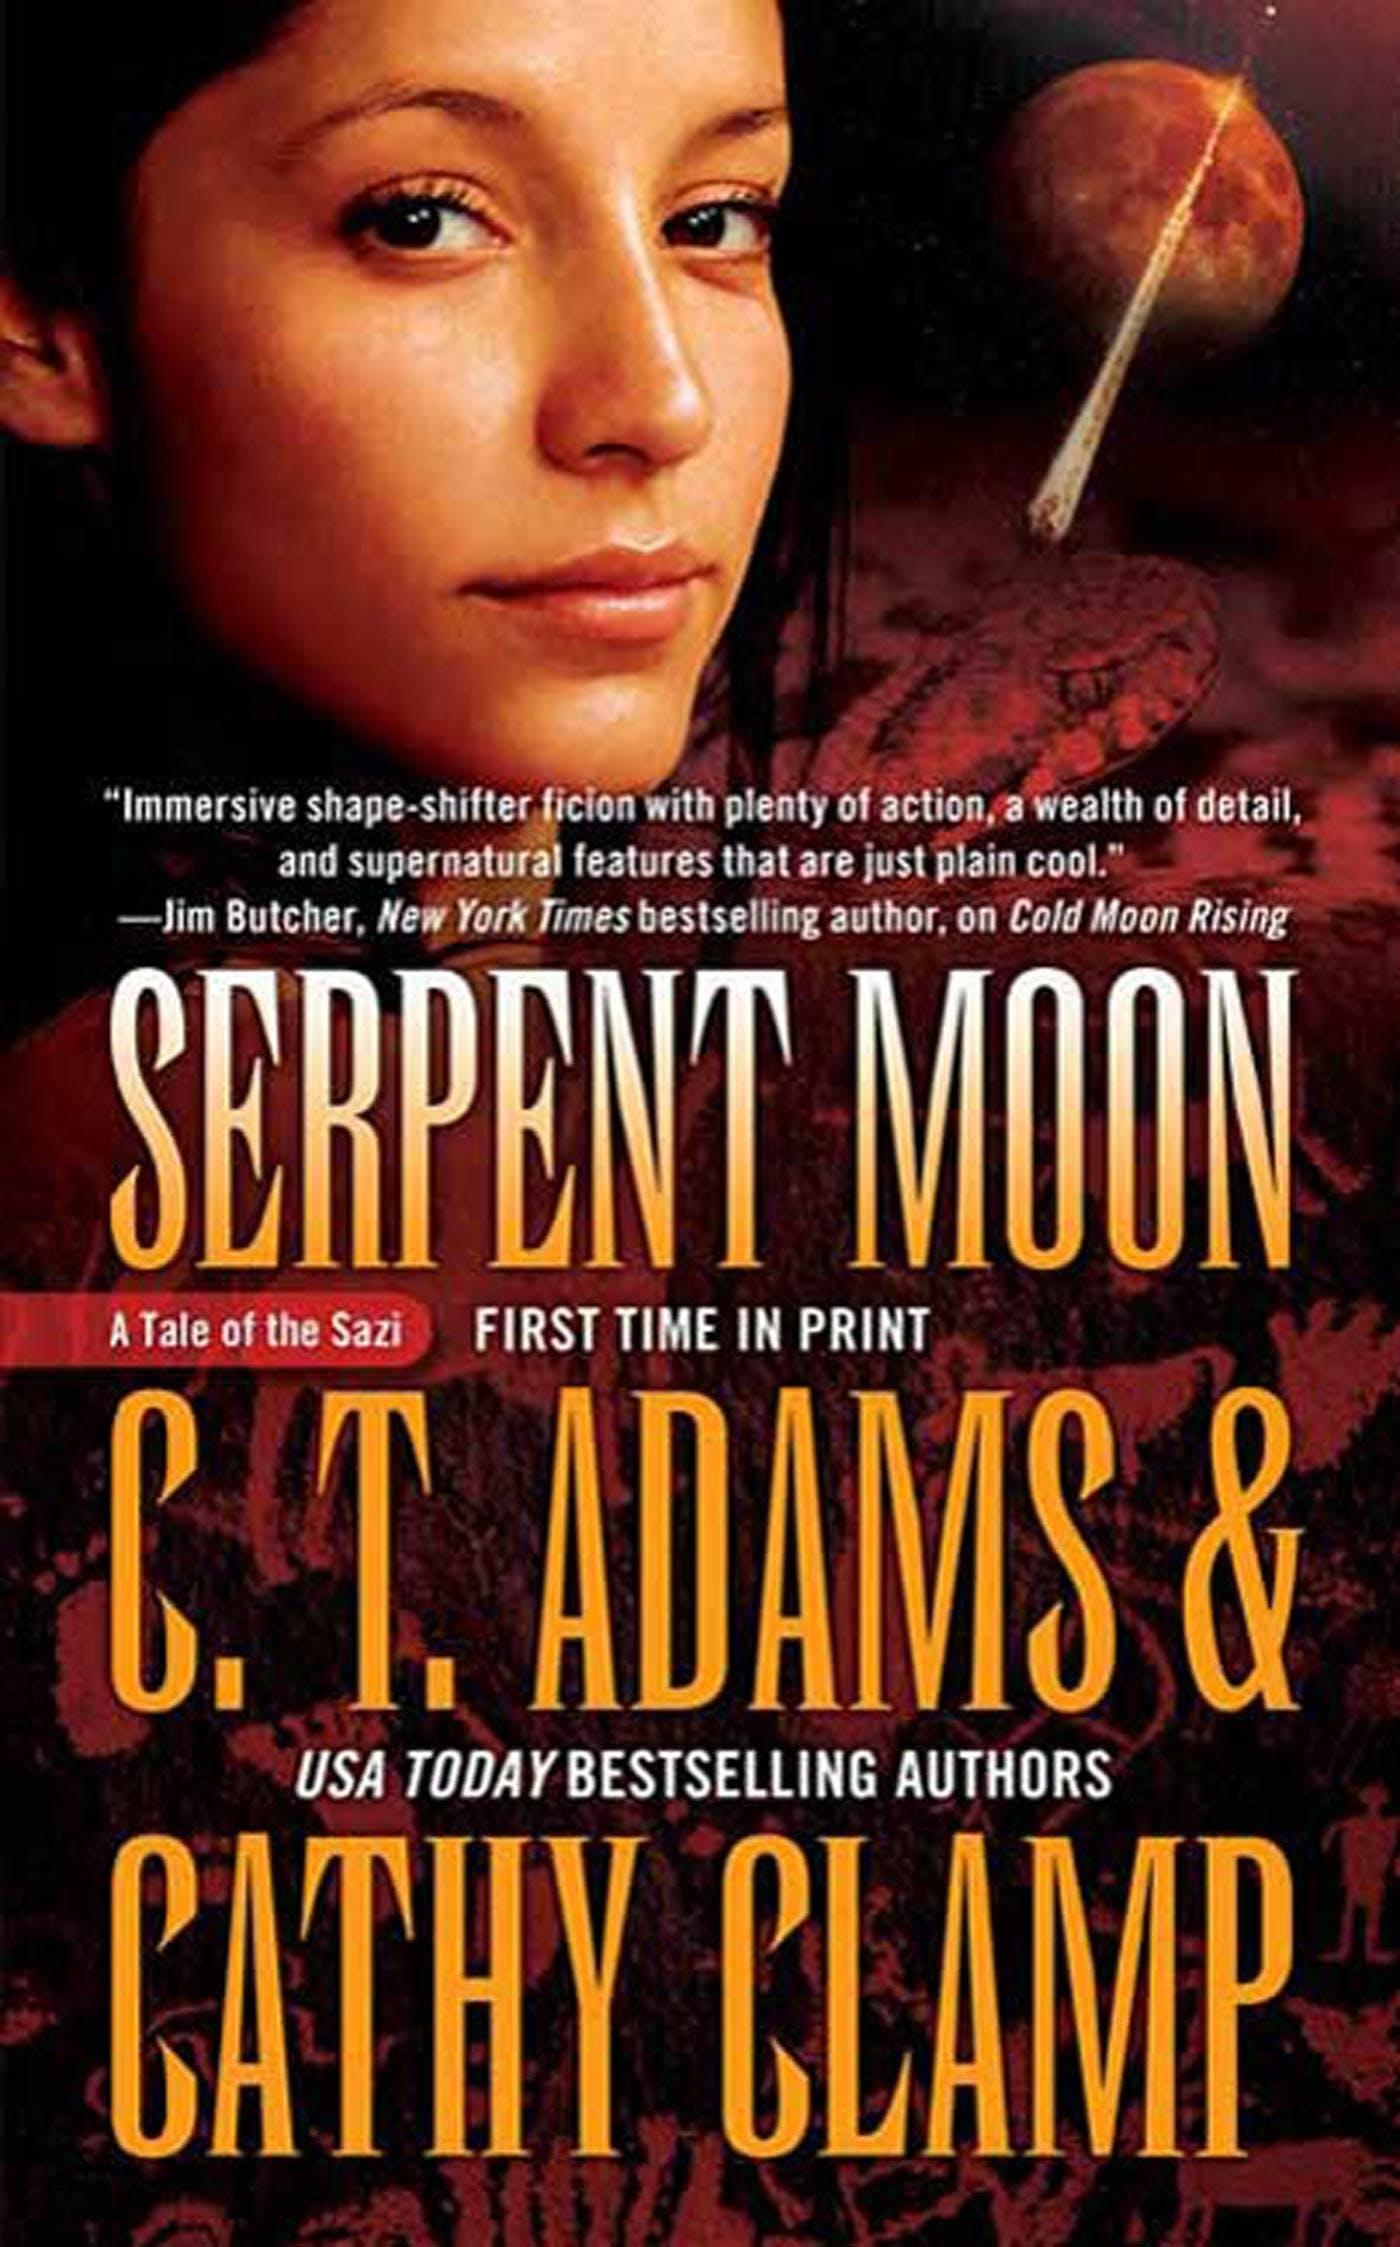 Image of Serpent Moon